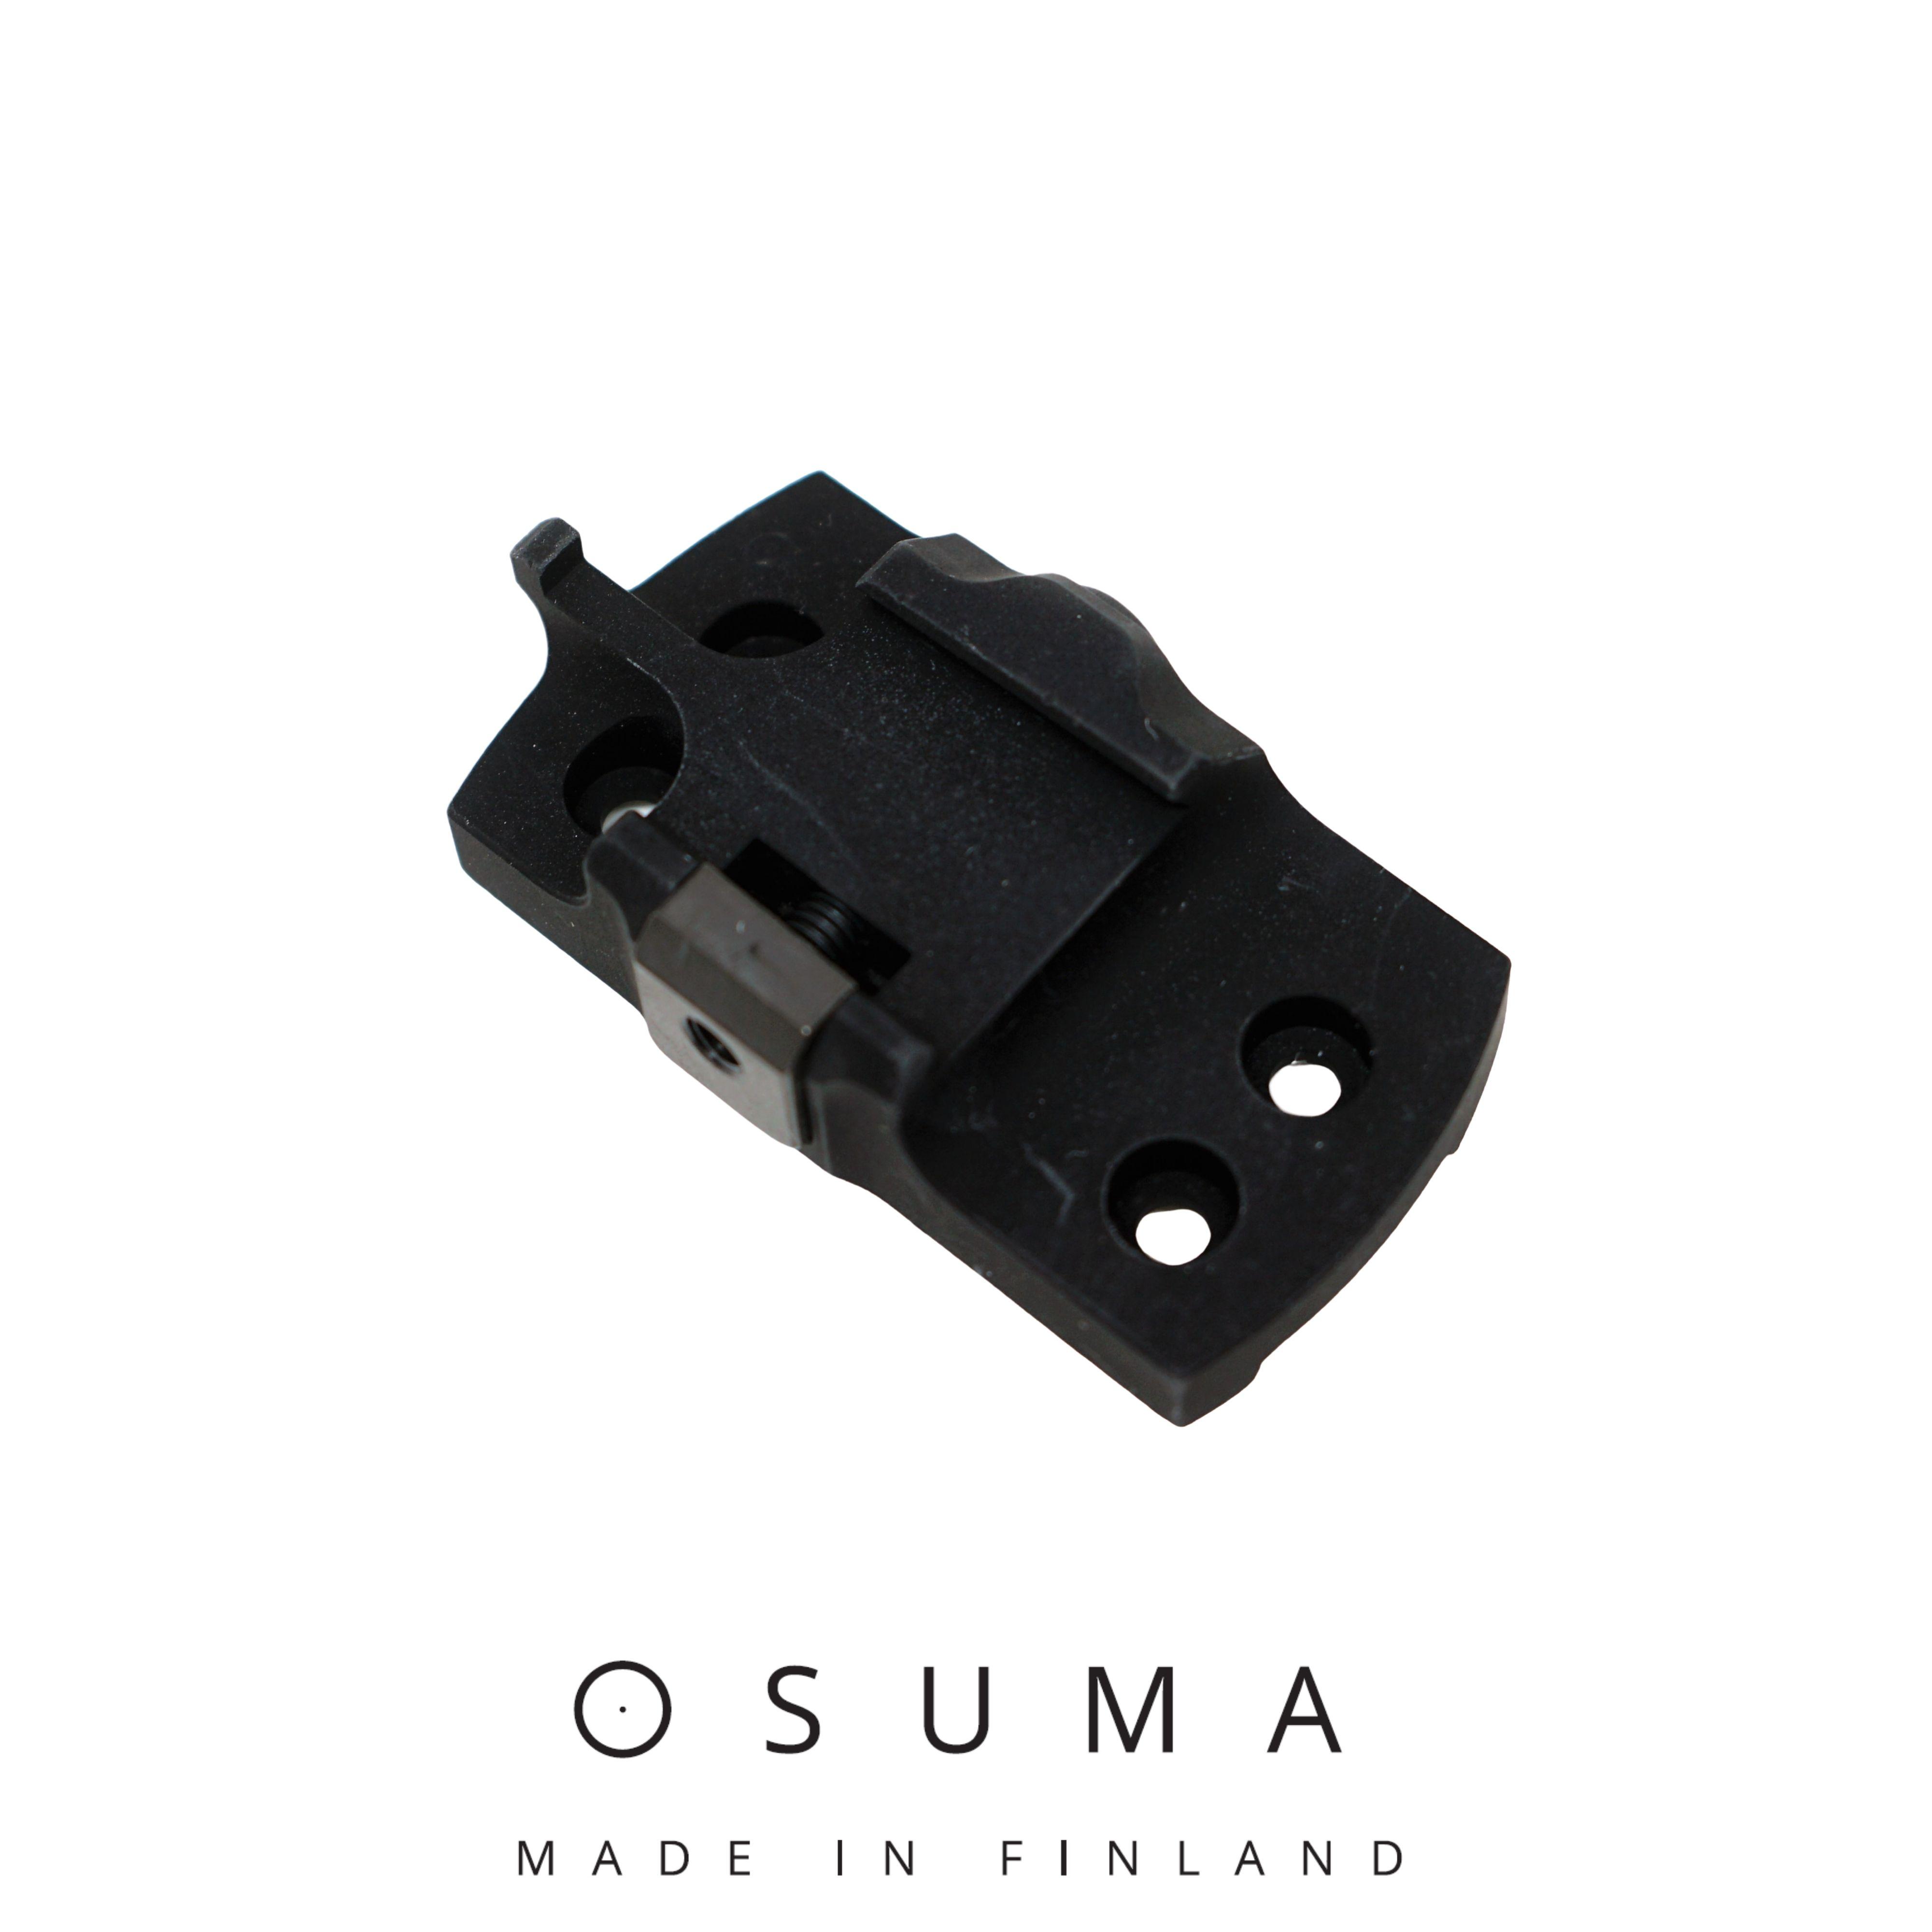 Osuma Aimpoint Micro jalusta Sako